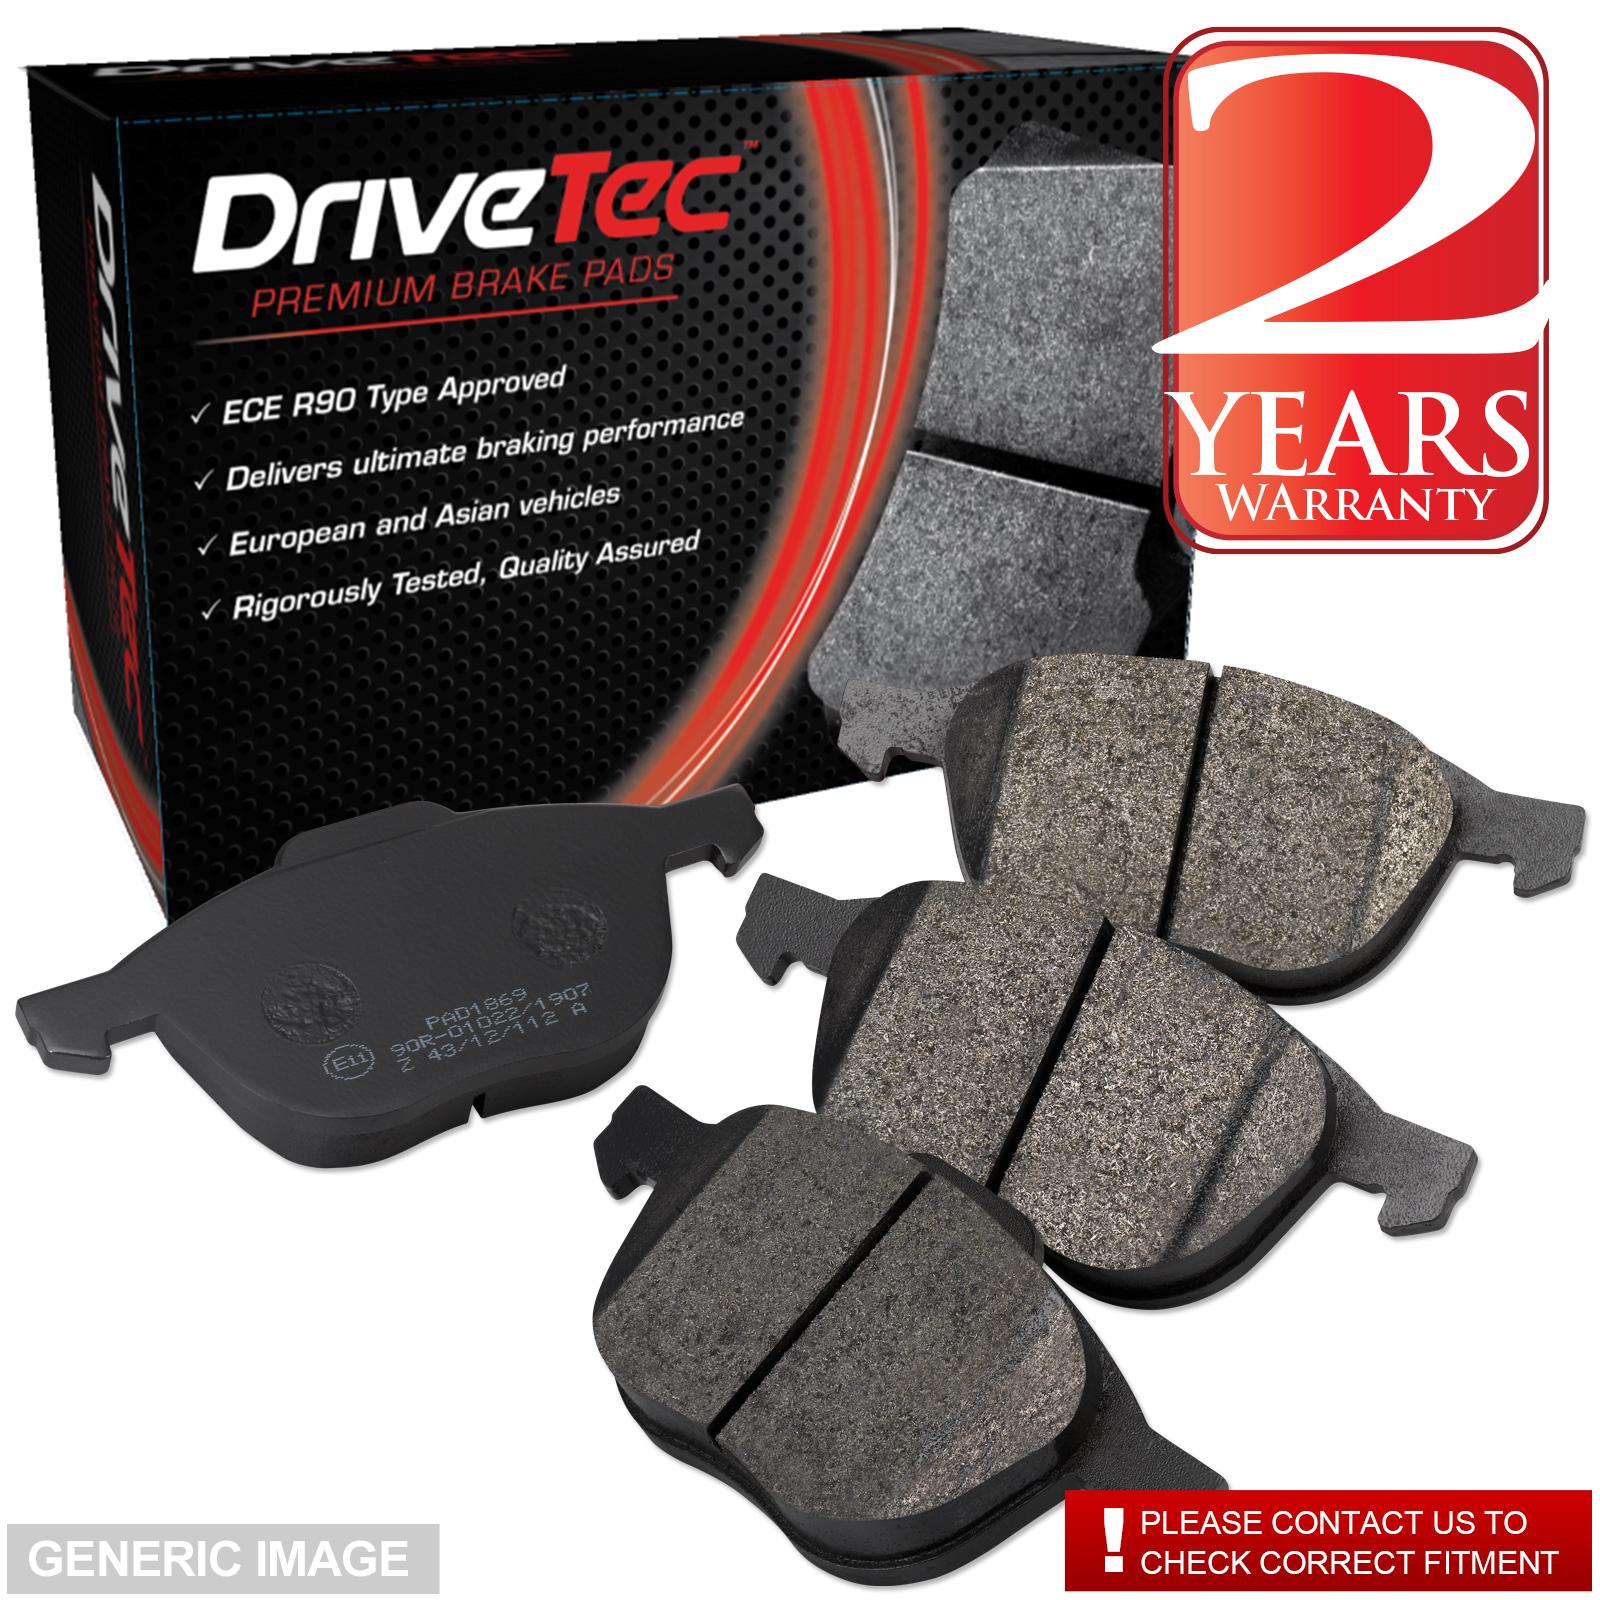 Front Drivetec Brake Pads Chevrolet Aveo 1.2 1.2 LPG 1.4 1.4 Turbo